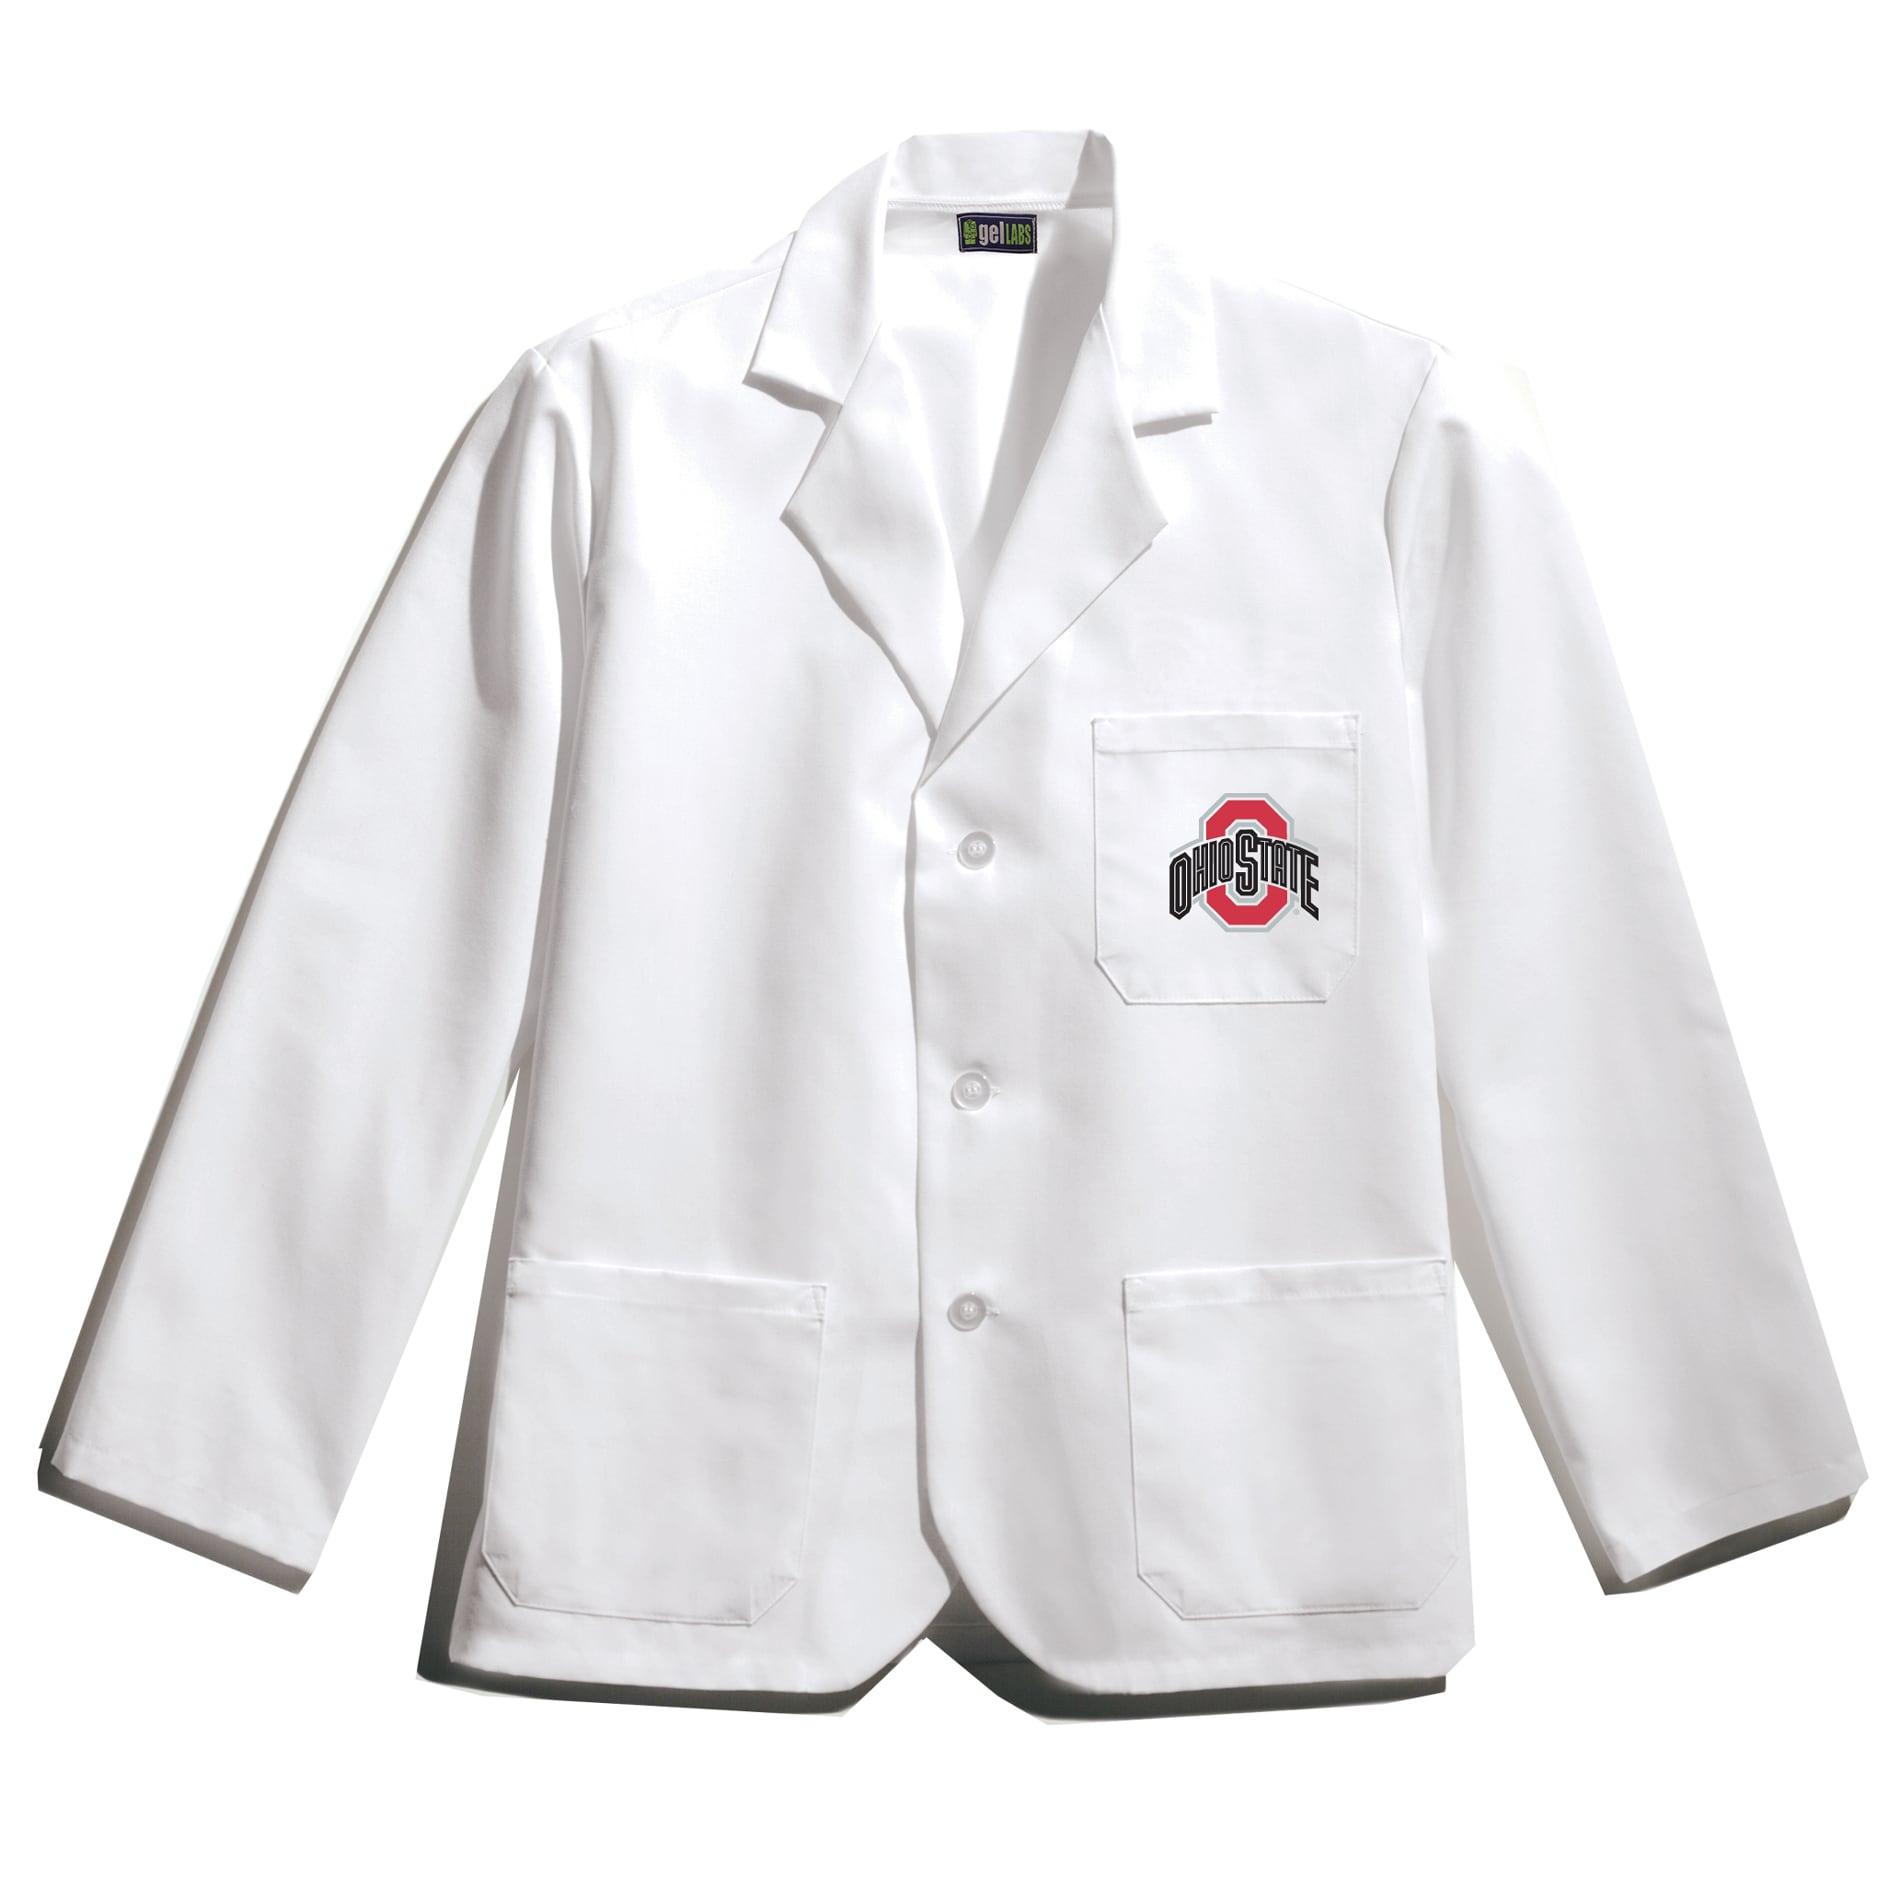 Gelscrubs Unisex NCAA Ohio State Buckeyes Short Labcoat